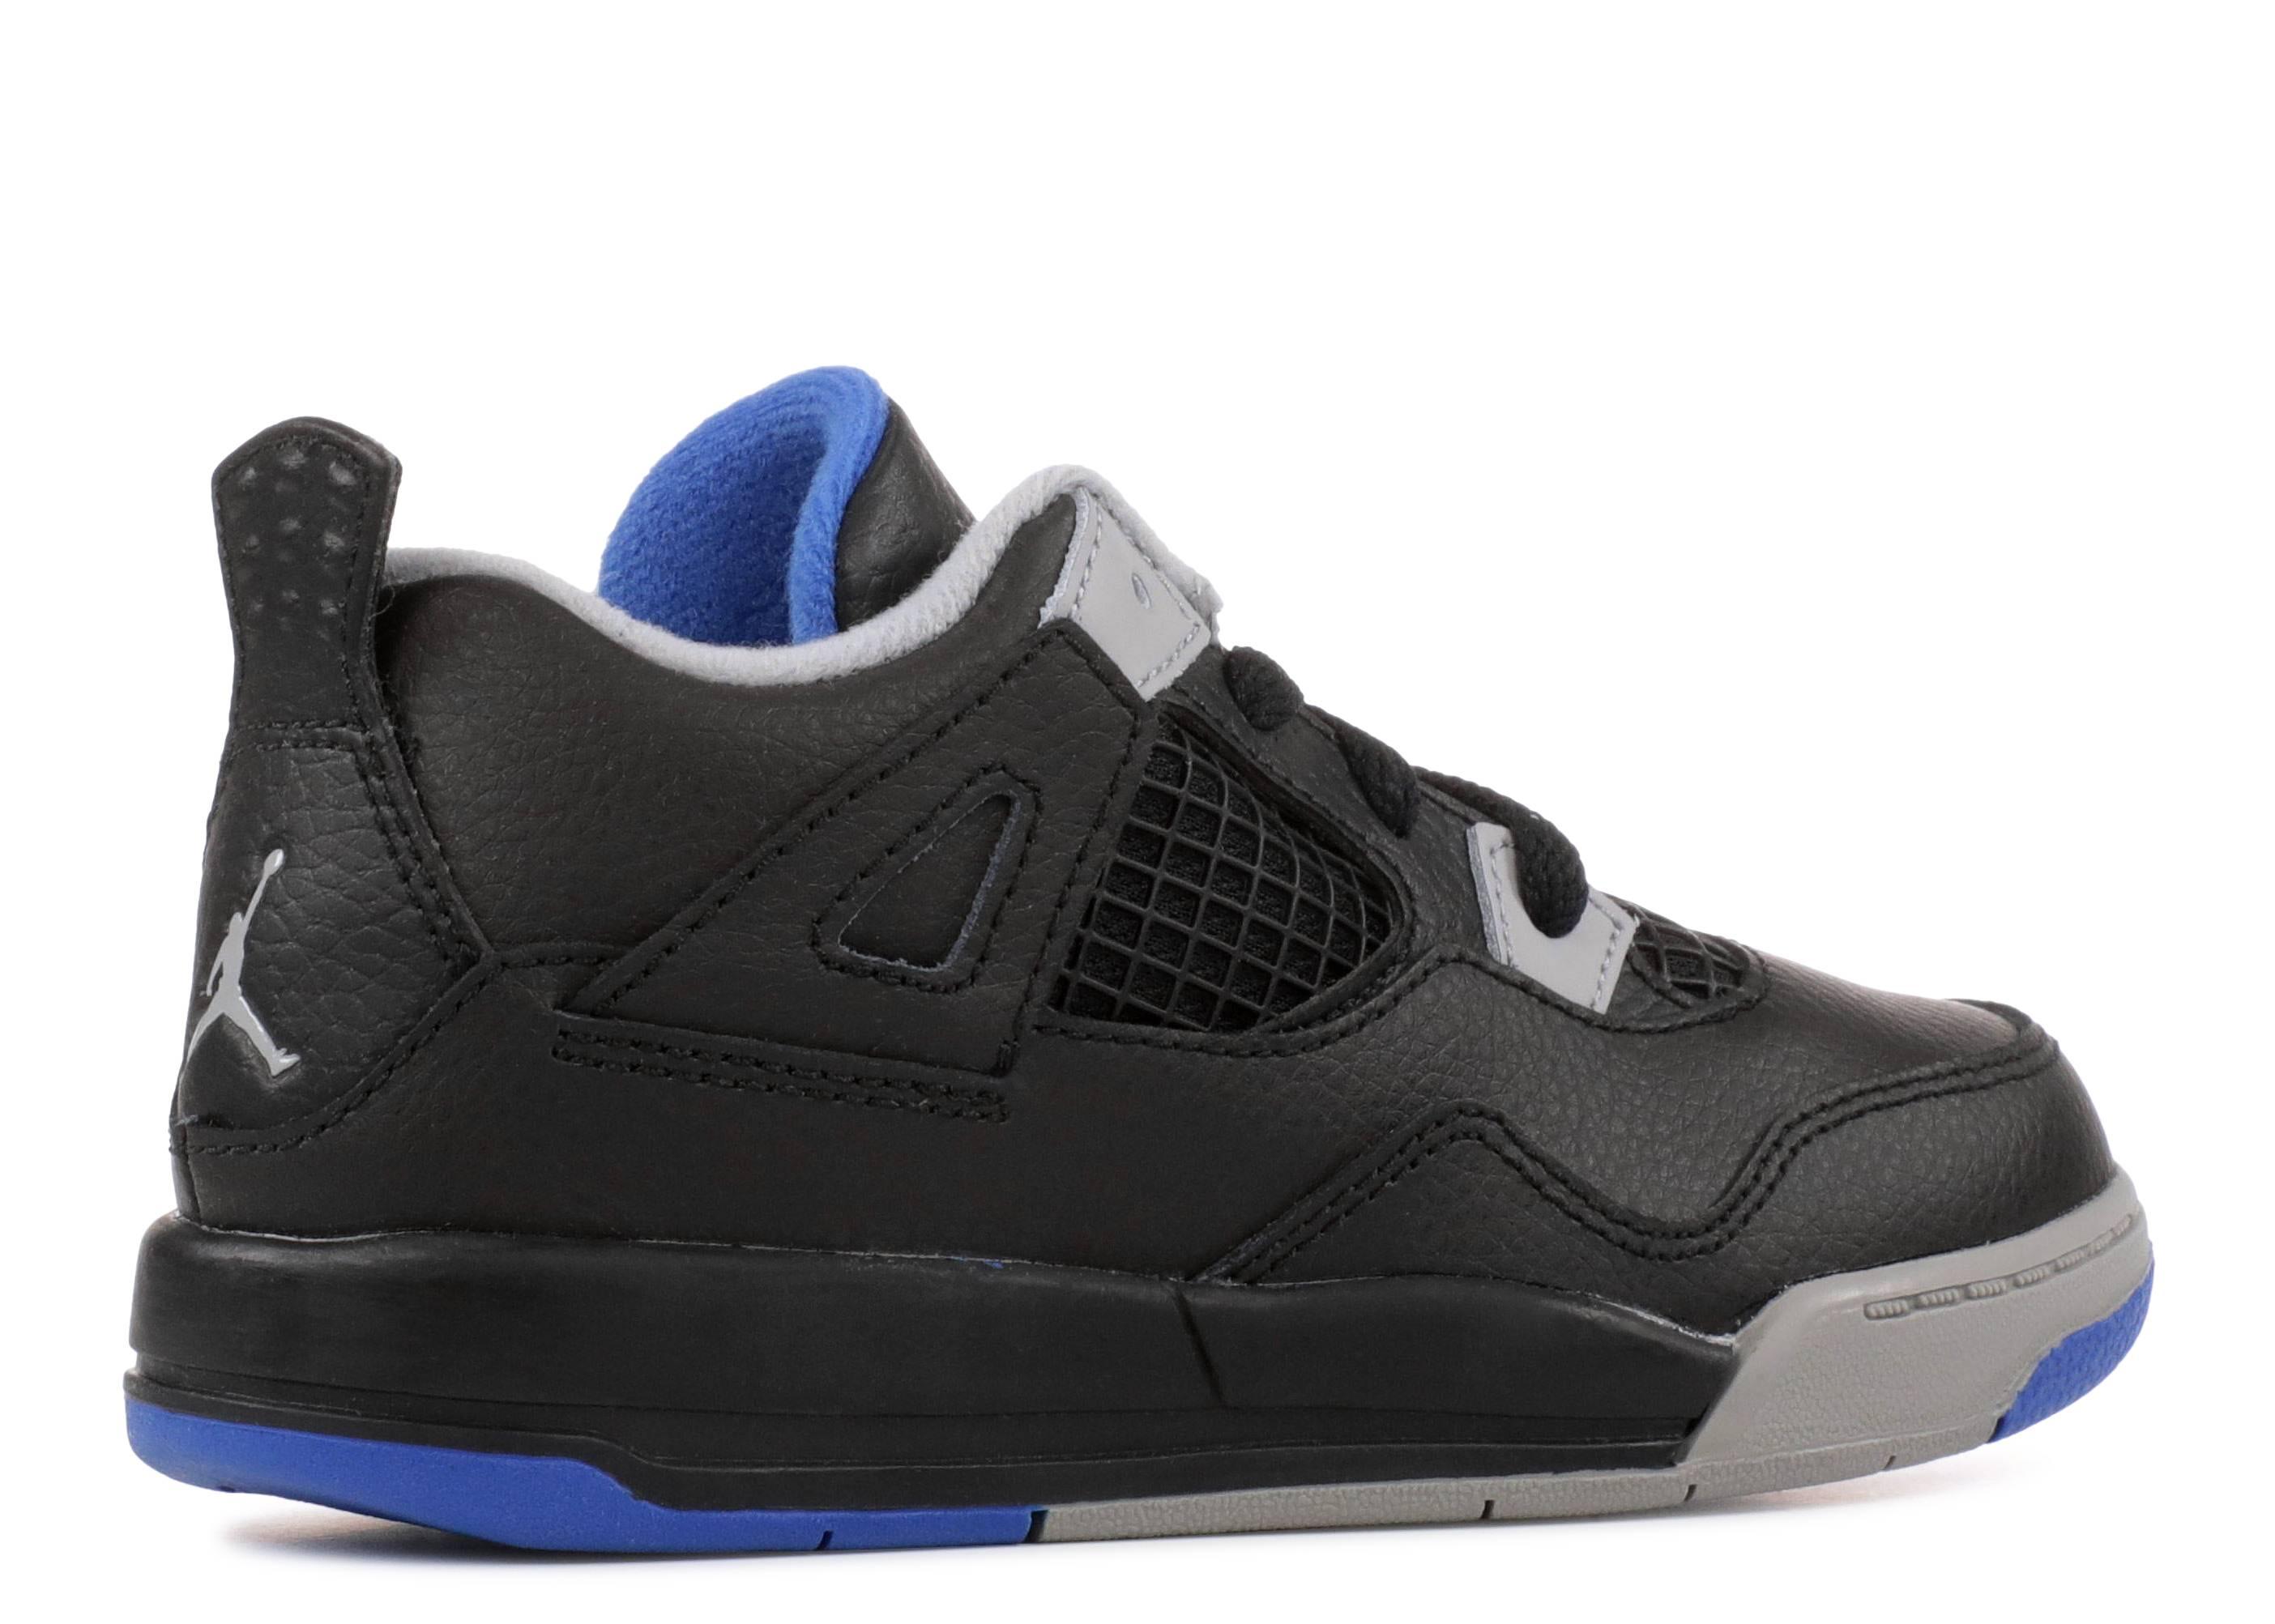 New Baby Air Jordan Retro 4 Toddler Shoes 308500-006 Toddler US 6 Eur 22